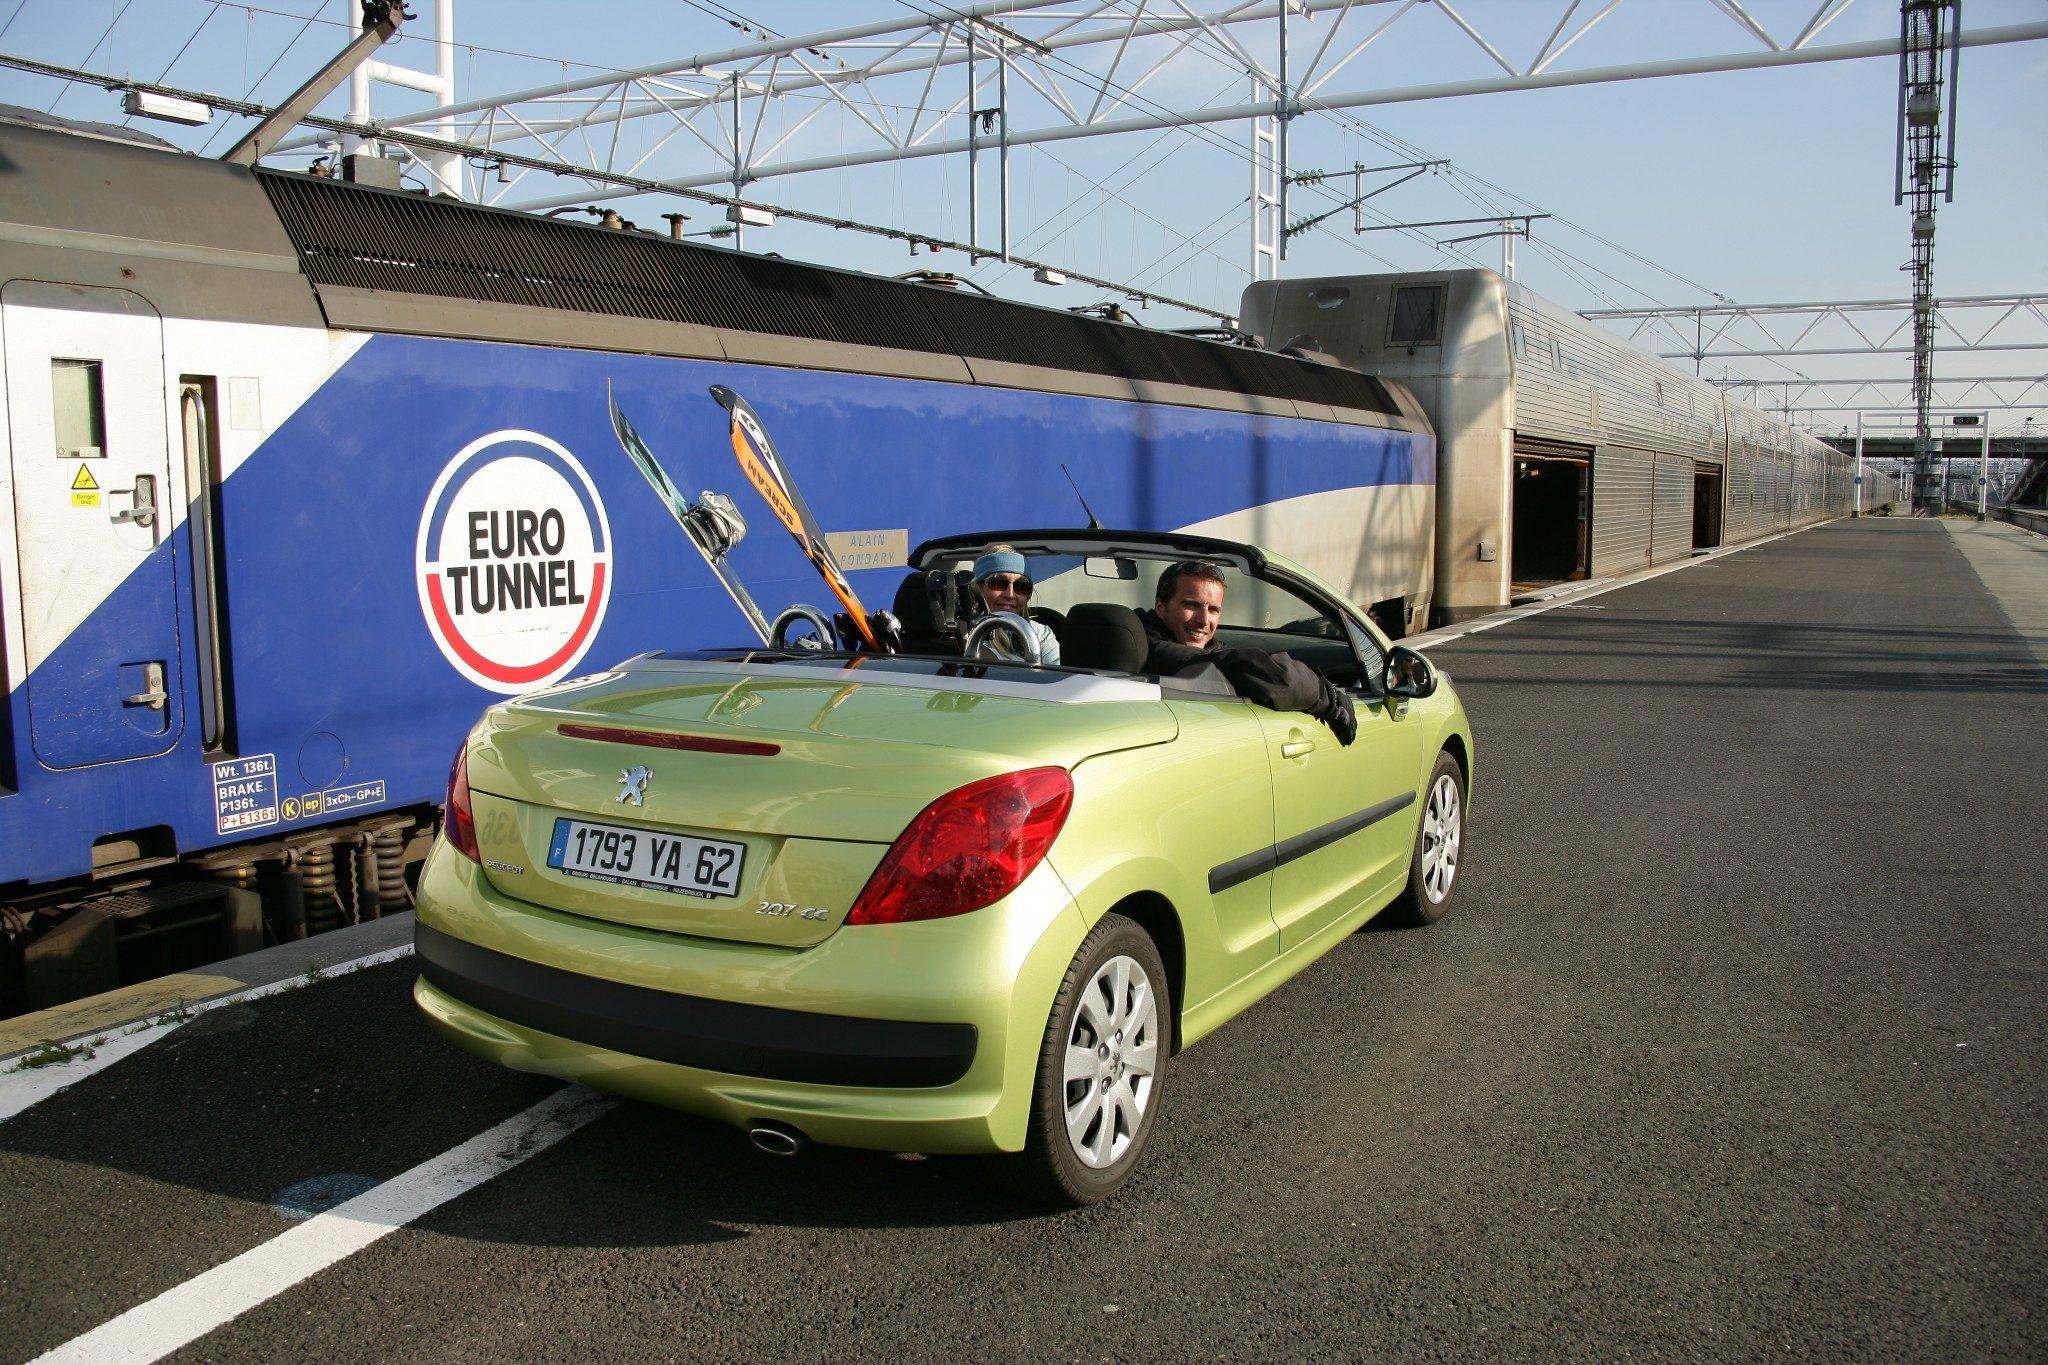 Eurotunnel ski-car